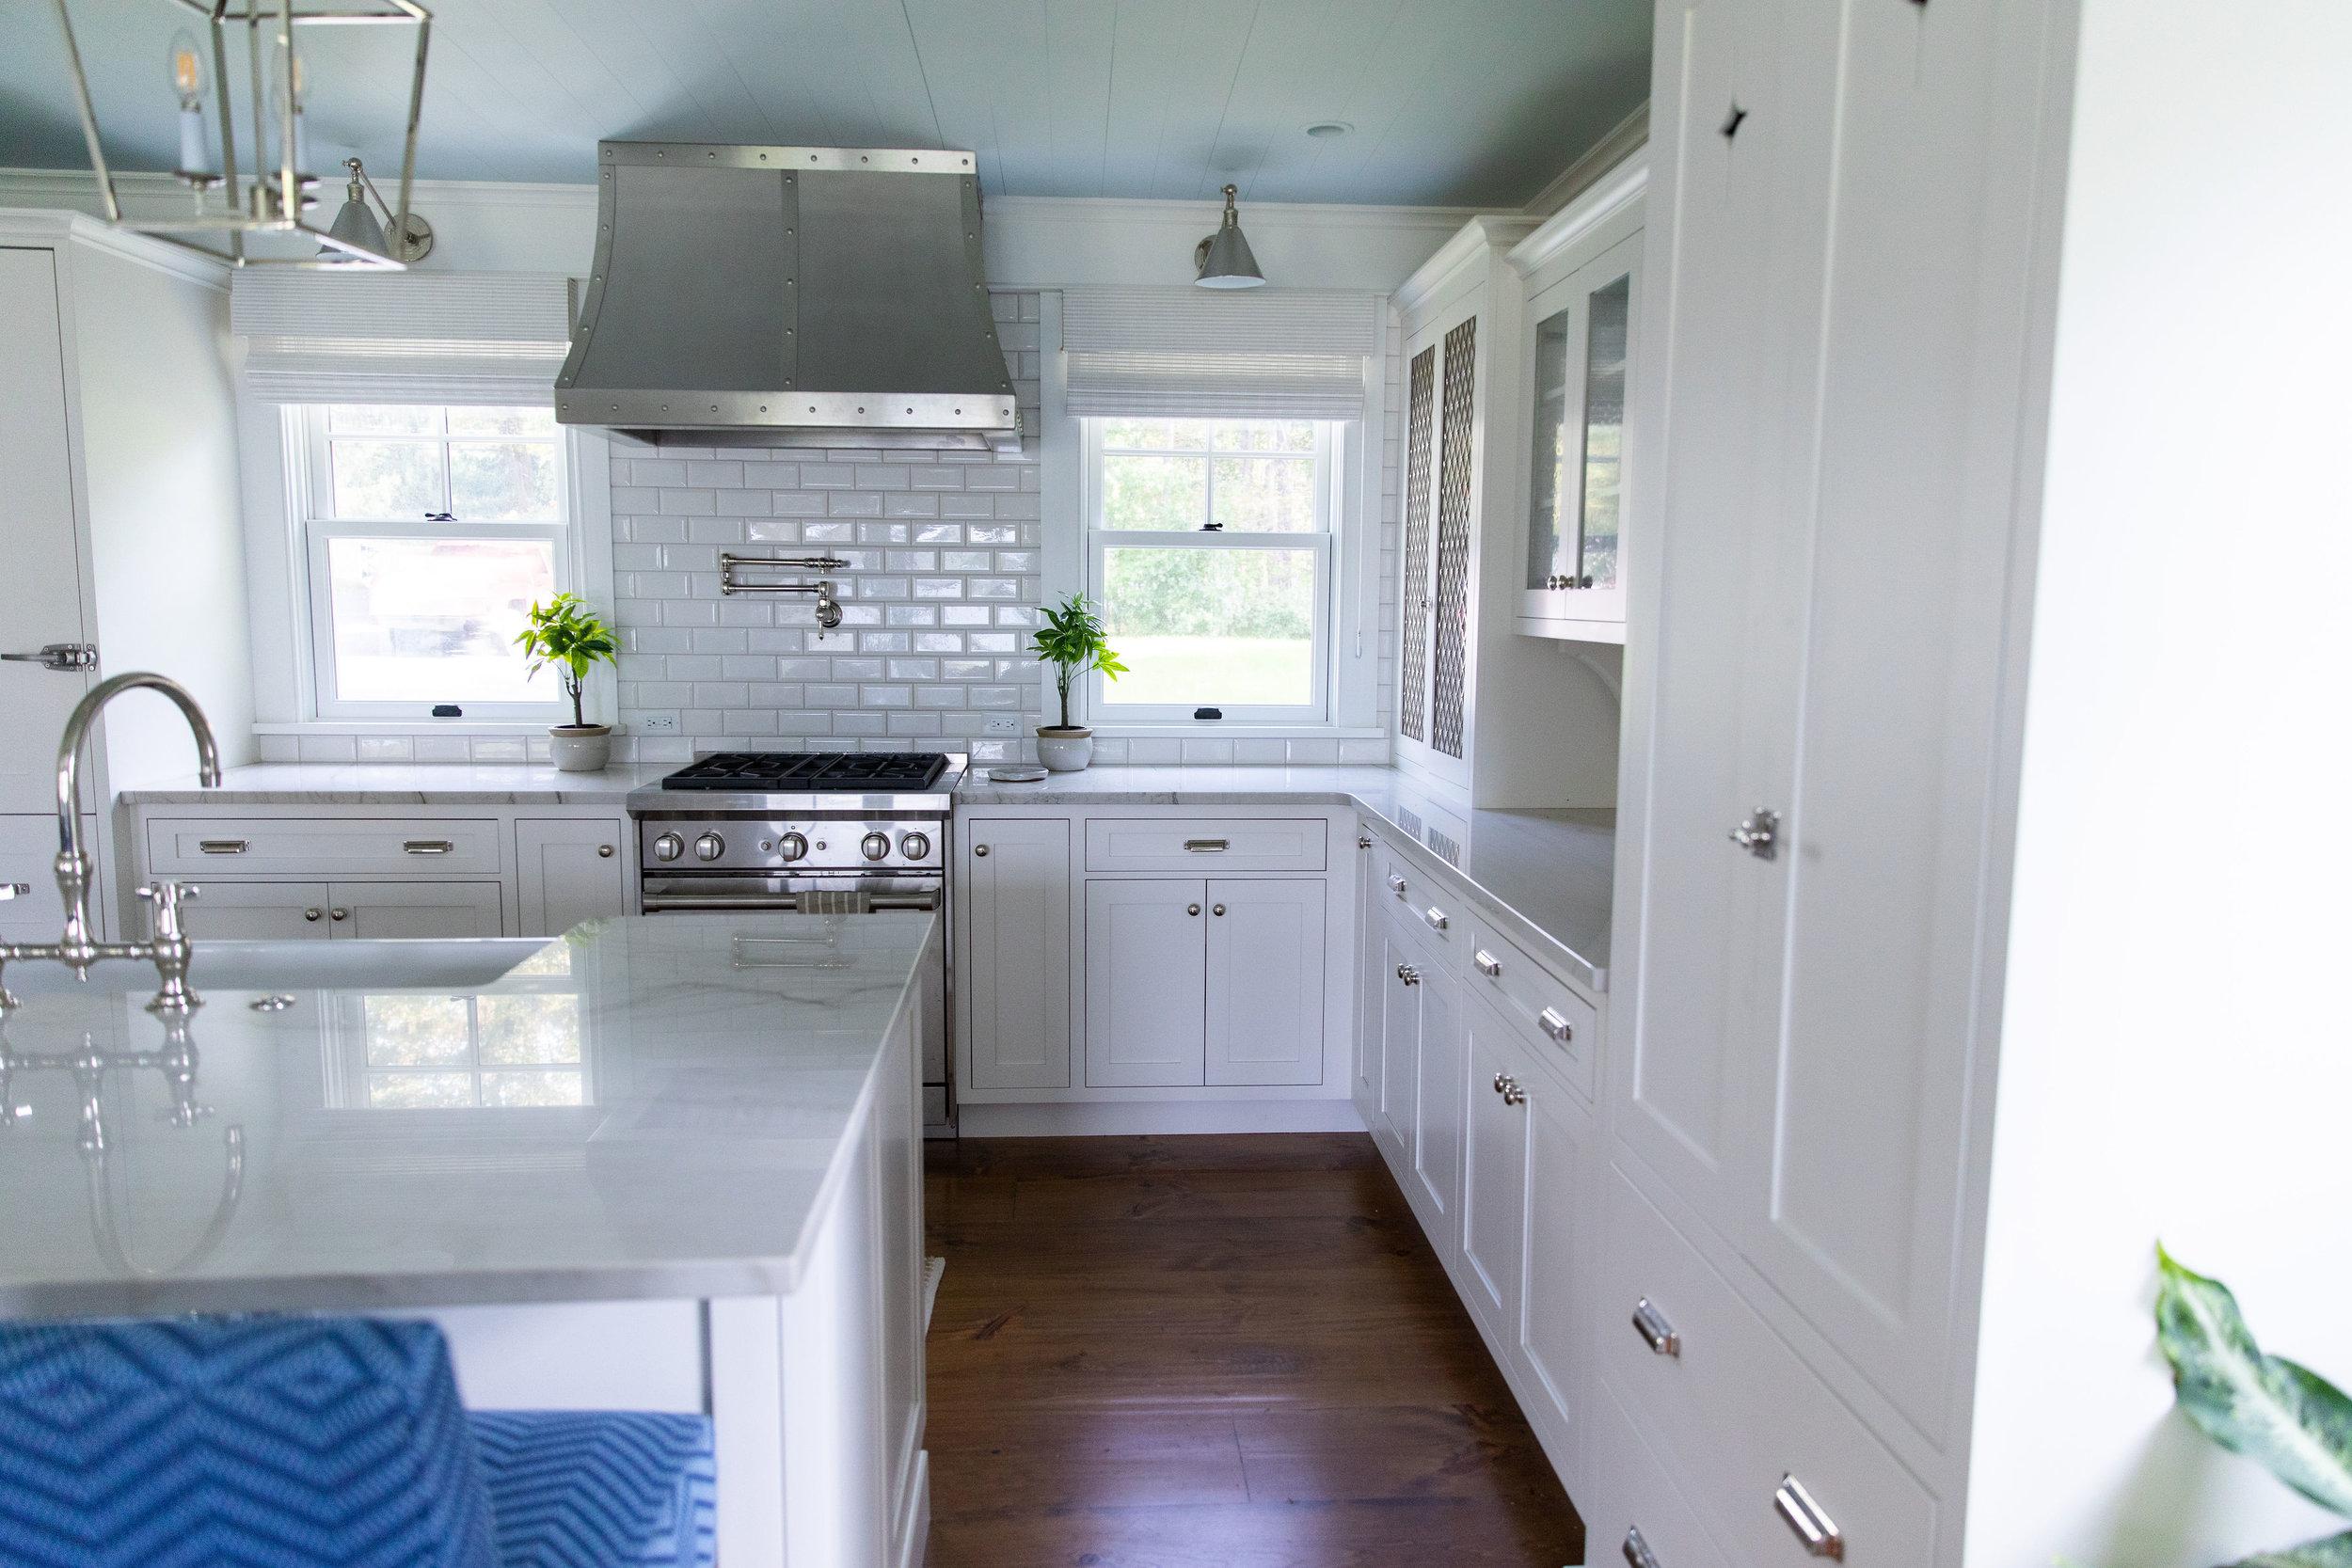 Cottage interior design style by Teaselwood Design, Skaneateles, NY interior designer